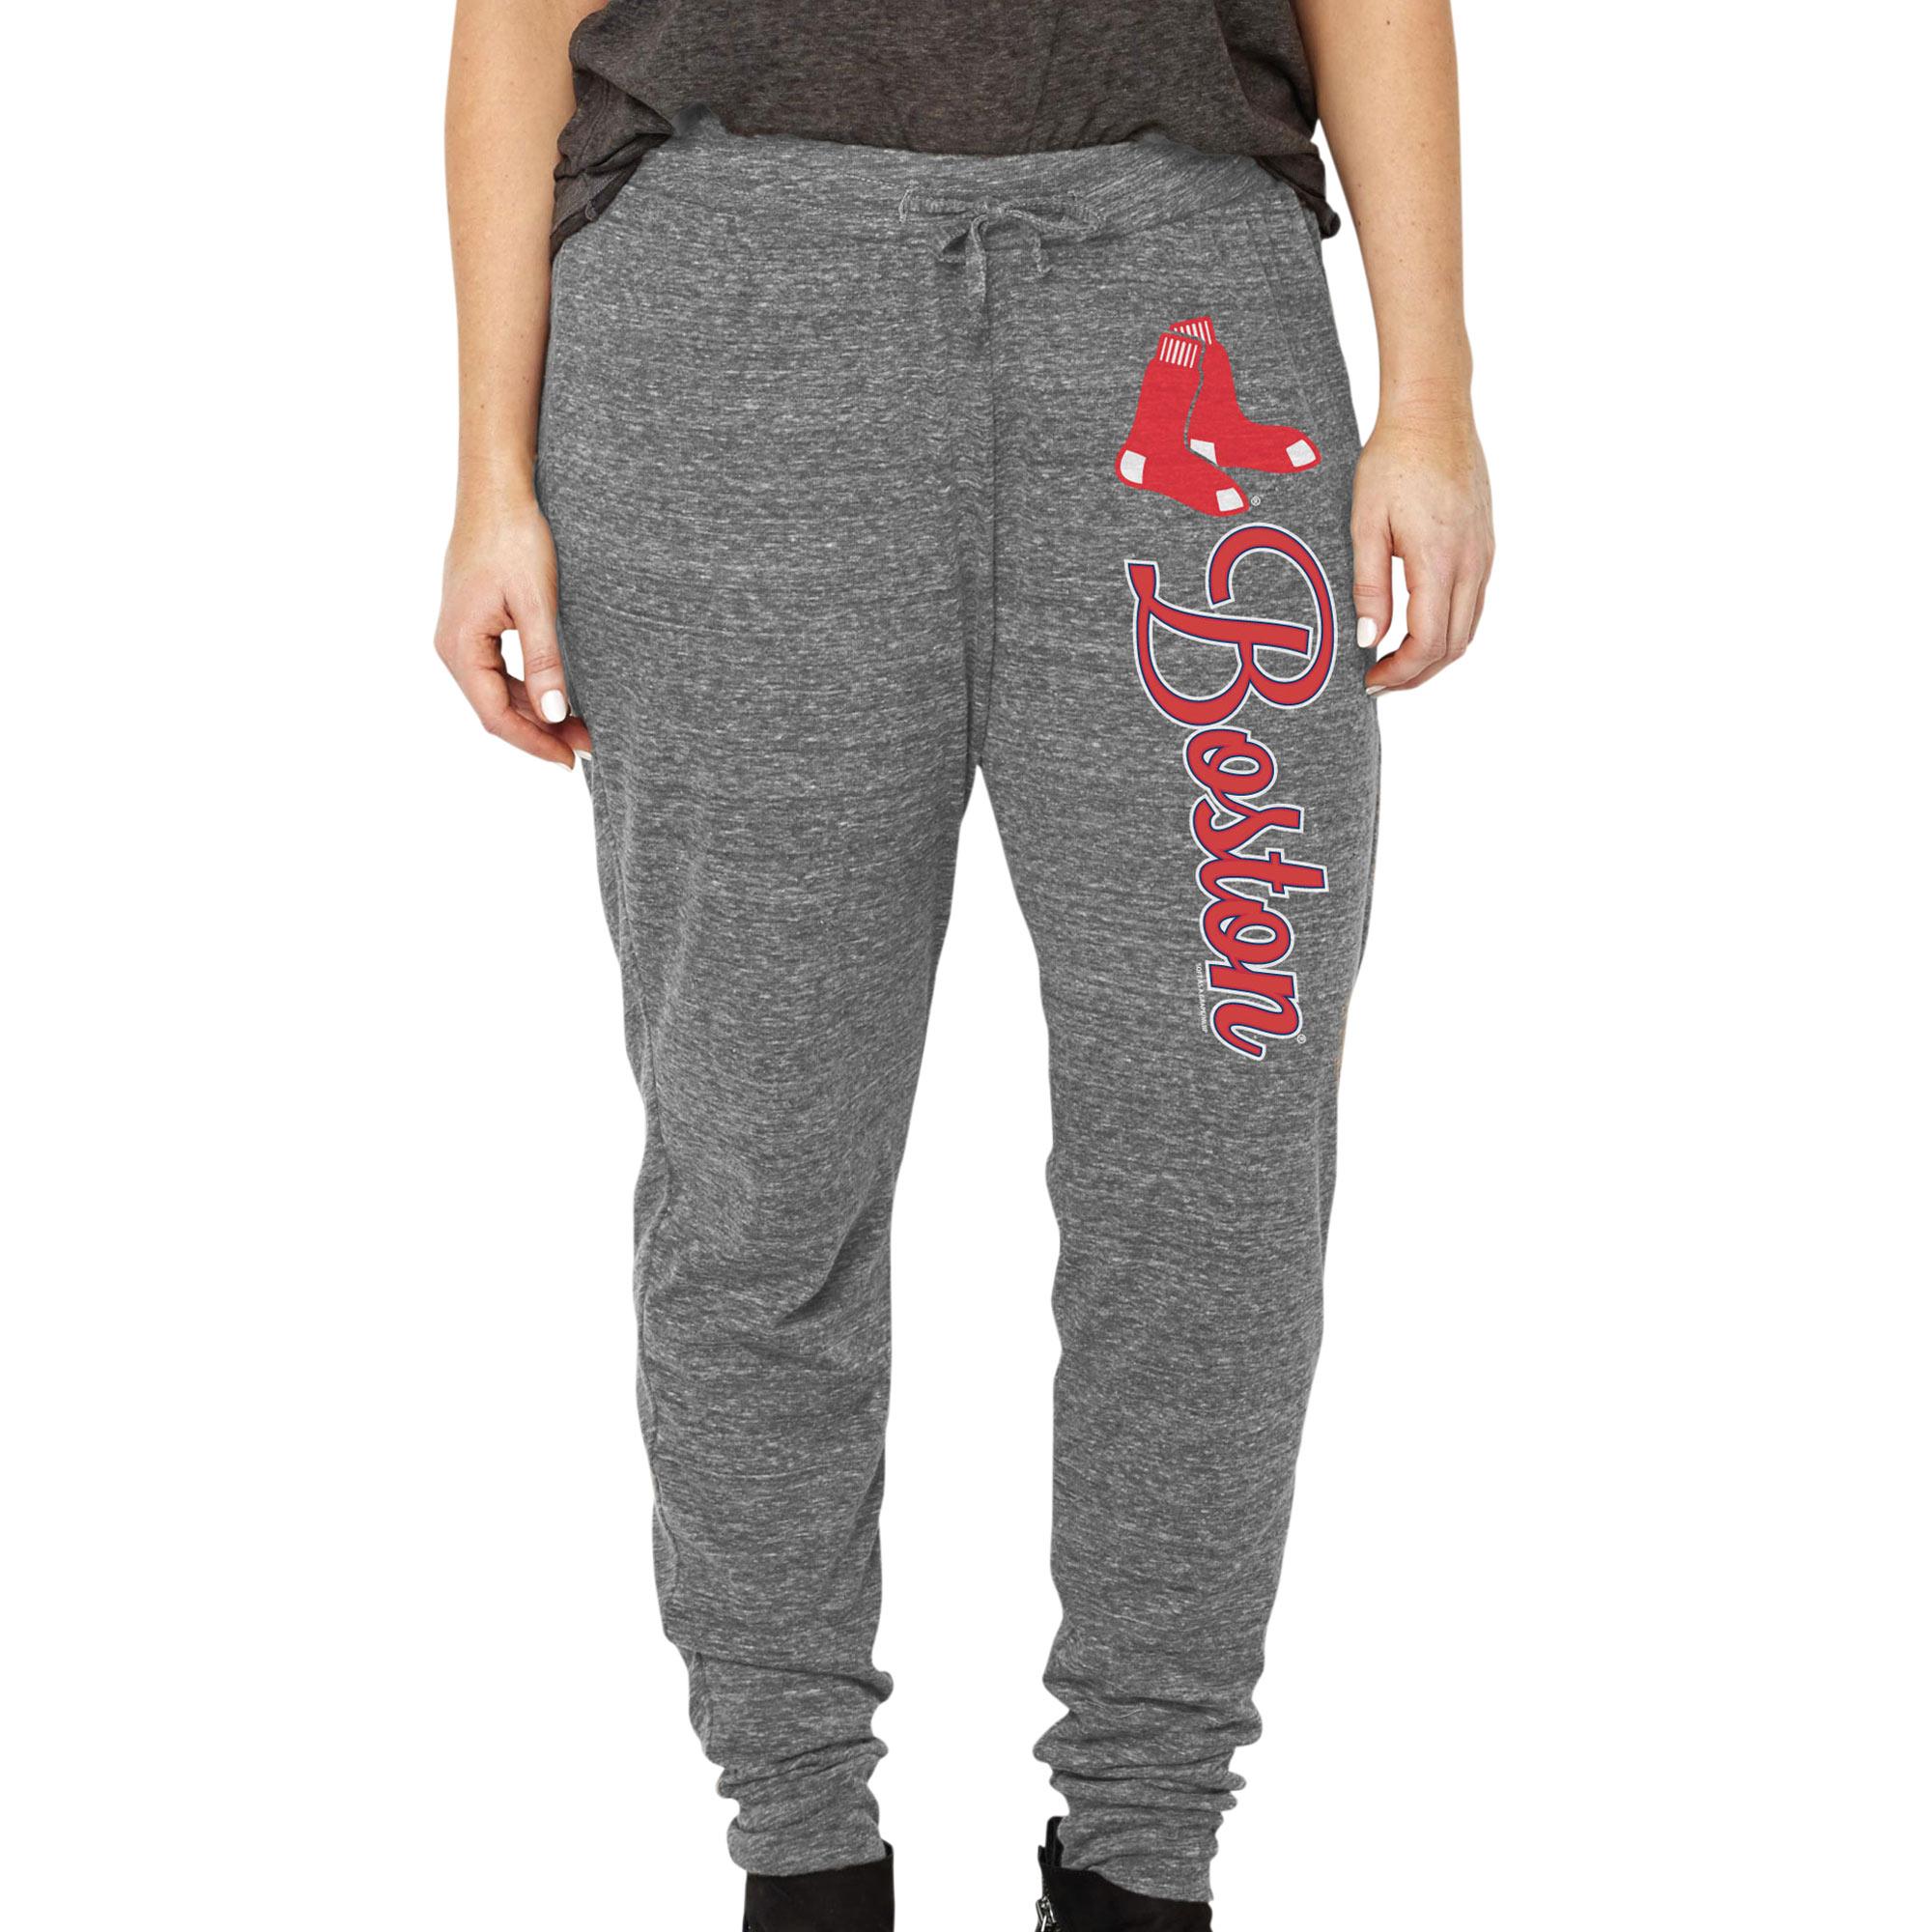 Boston Red Sox Soft as a Grape Women's Plus Size Jogger Pants - Heathered Gray